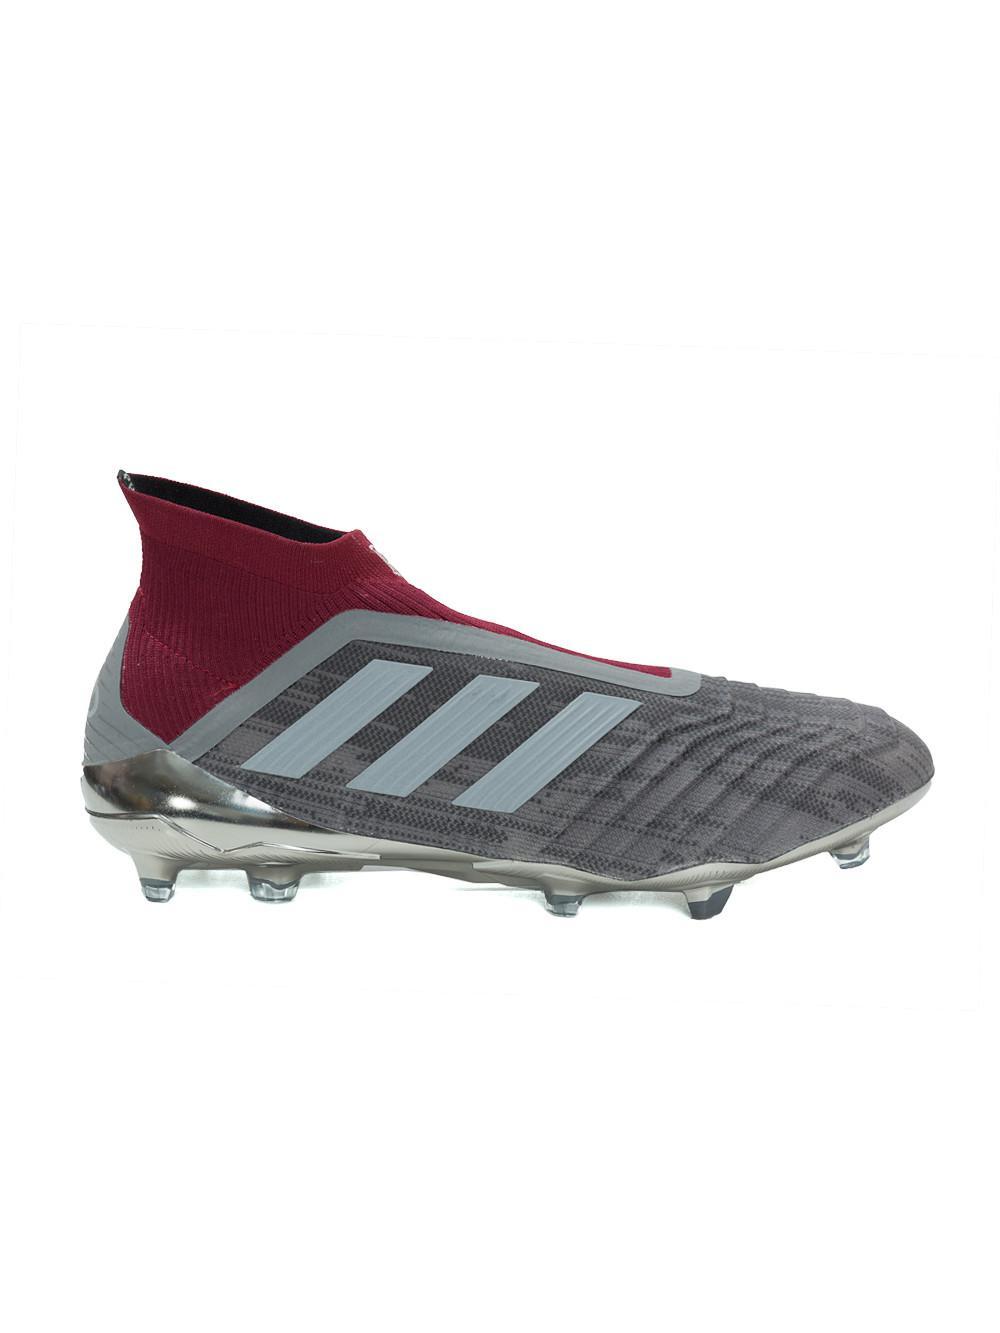 sale retailer e5faf e979d Lyst - adidas X Paul Pogba Predator 18+ Fg Soccer Boots for